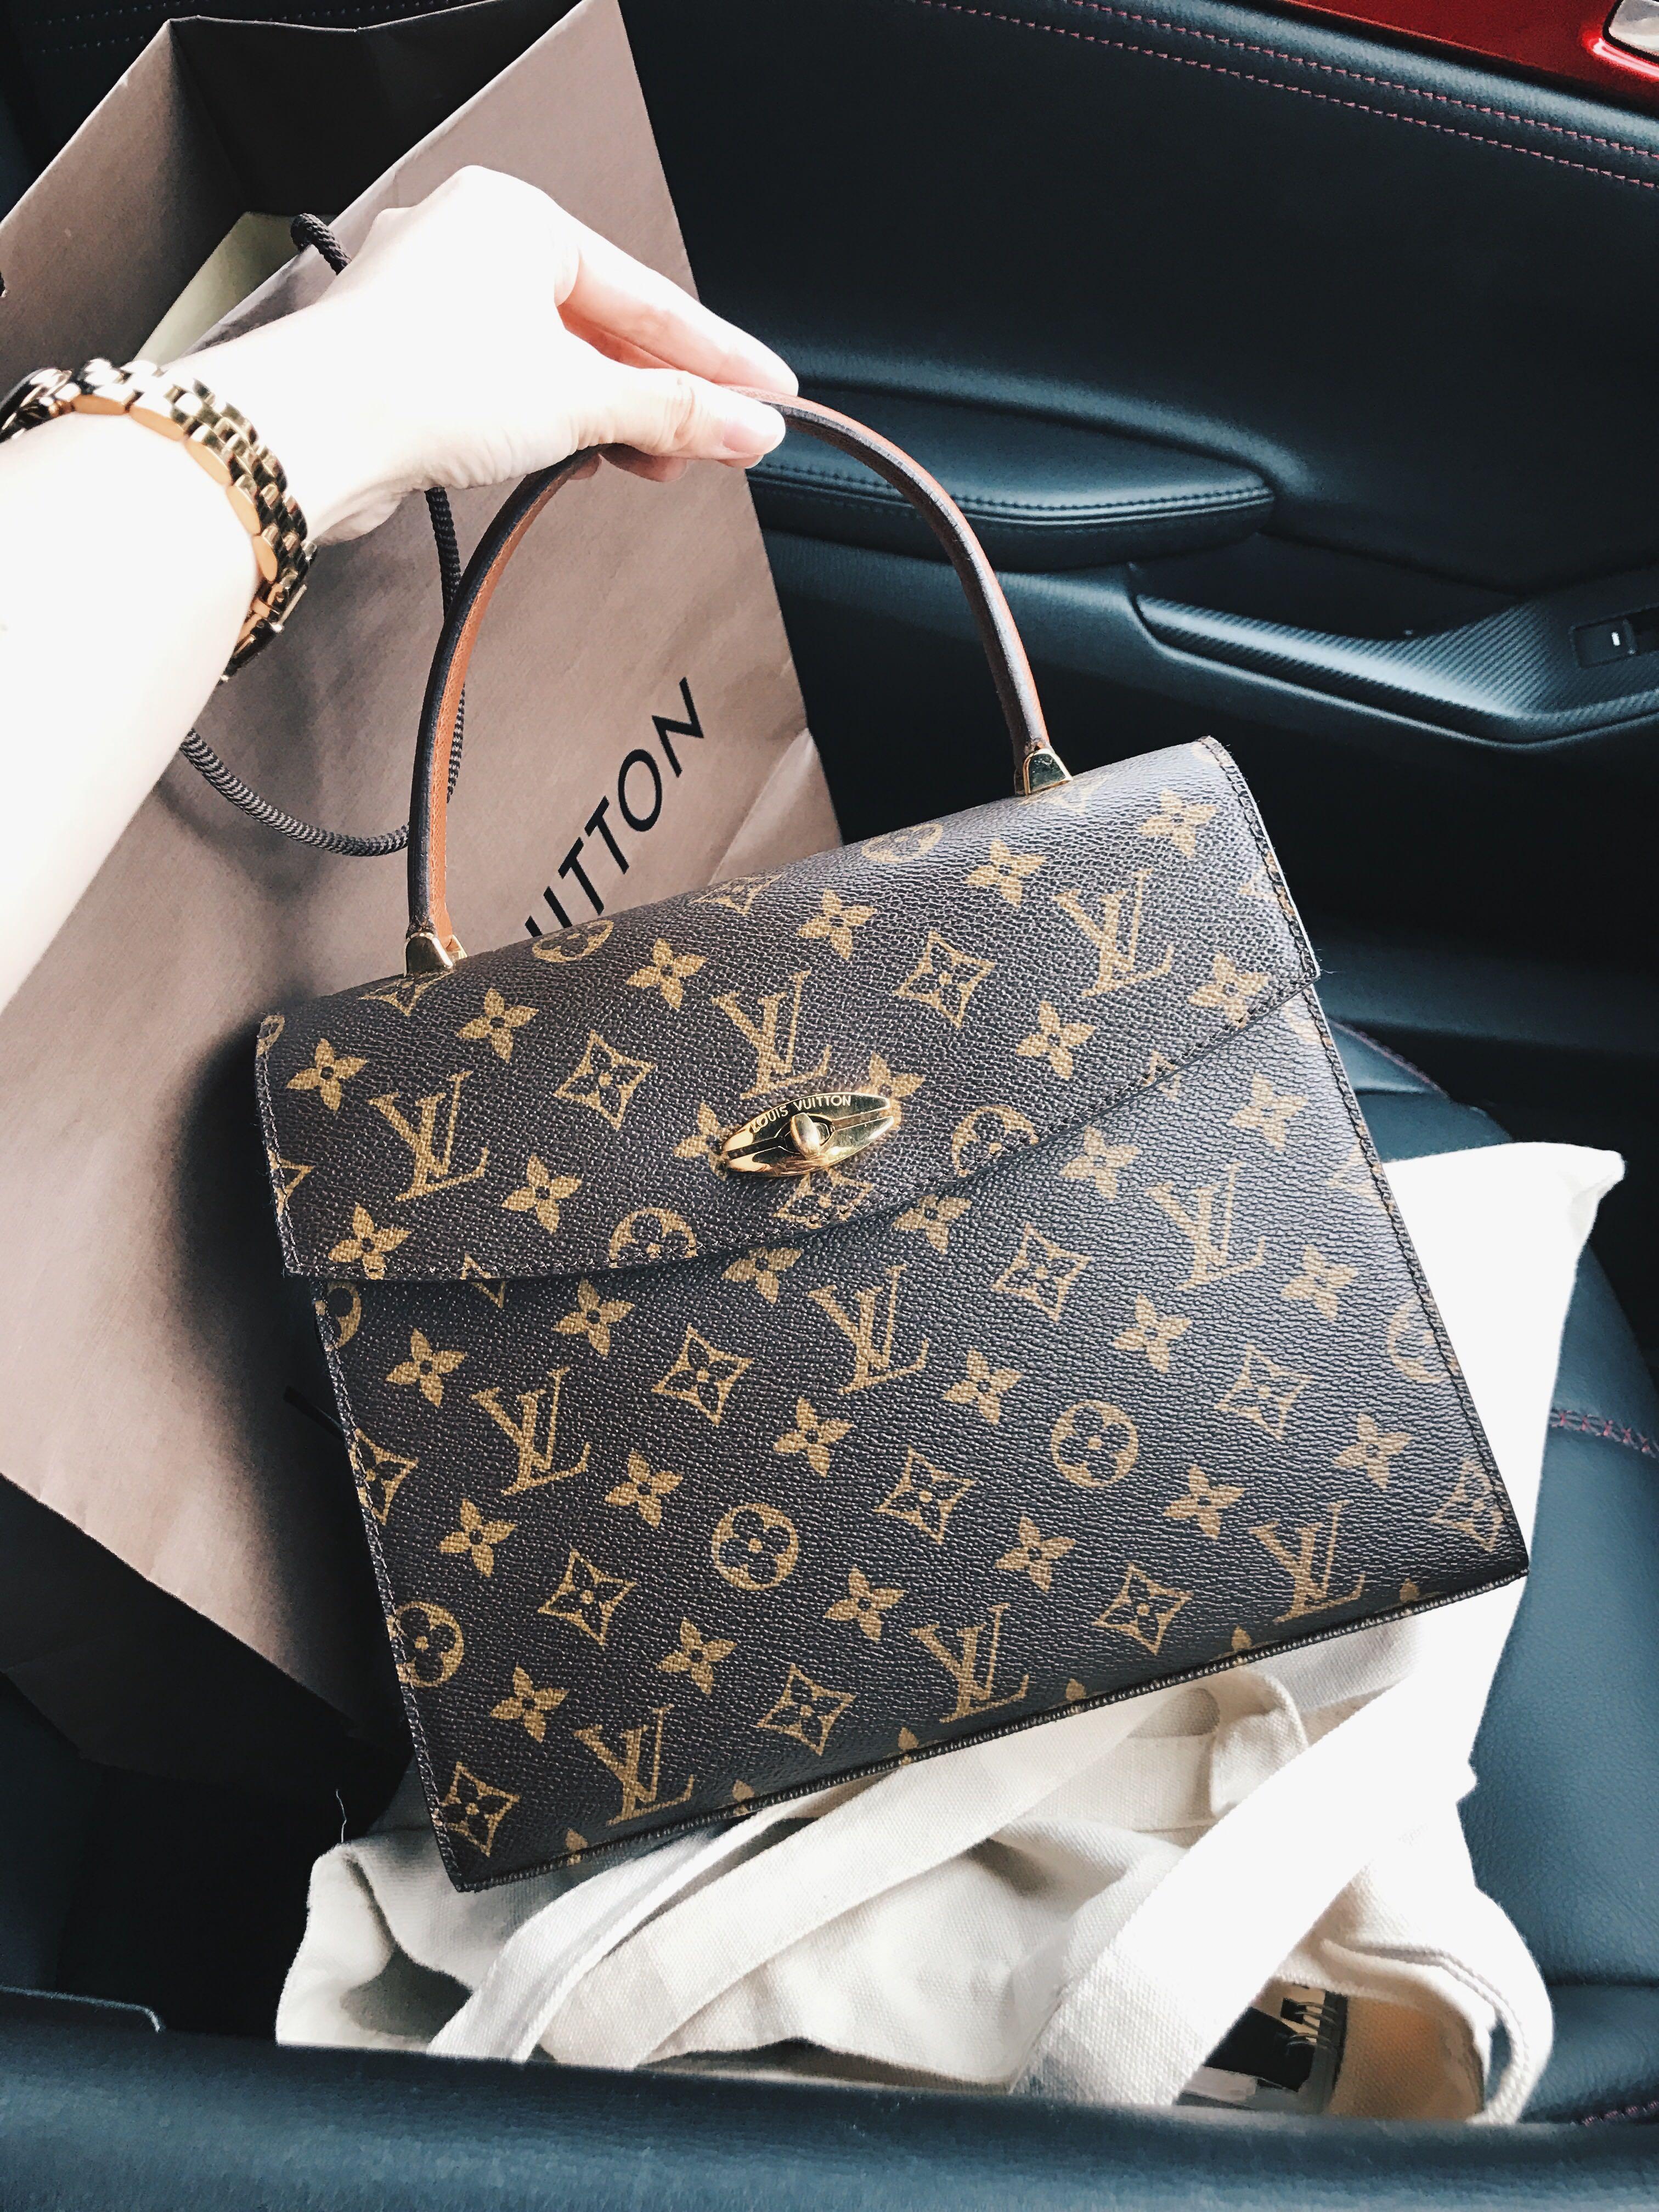 fdb3f5353f3 Louis Vuitton LV Kelly Malesherbes bag